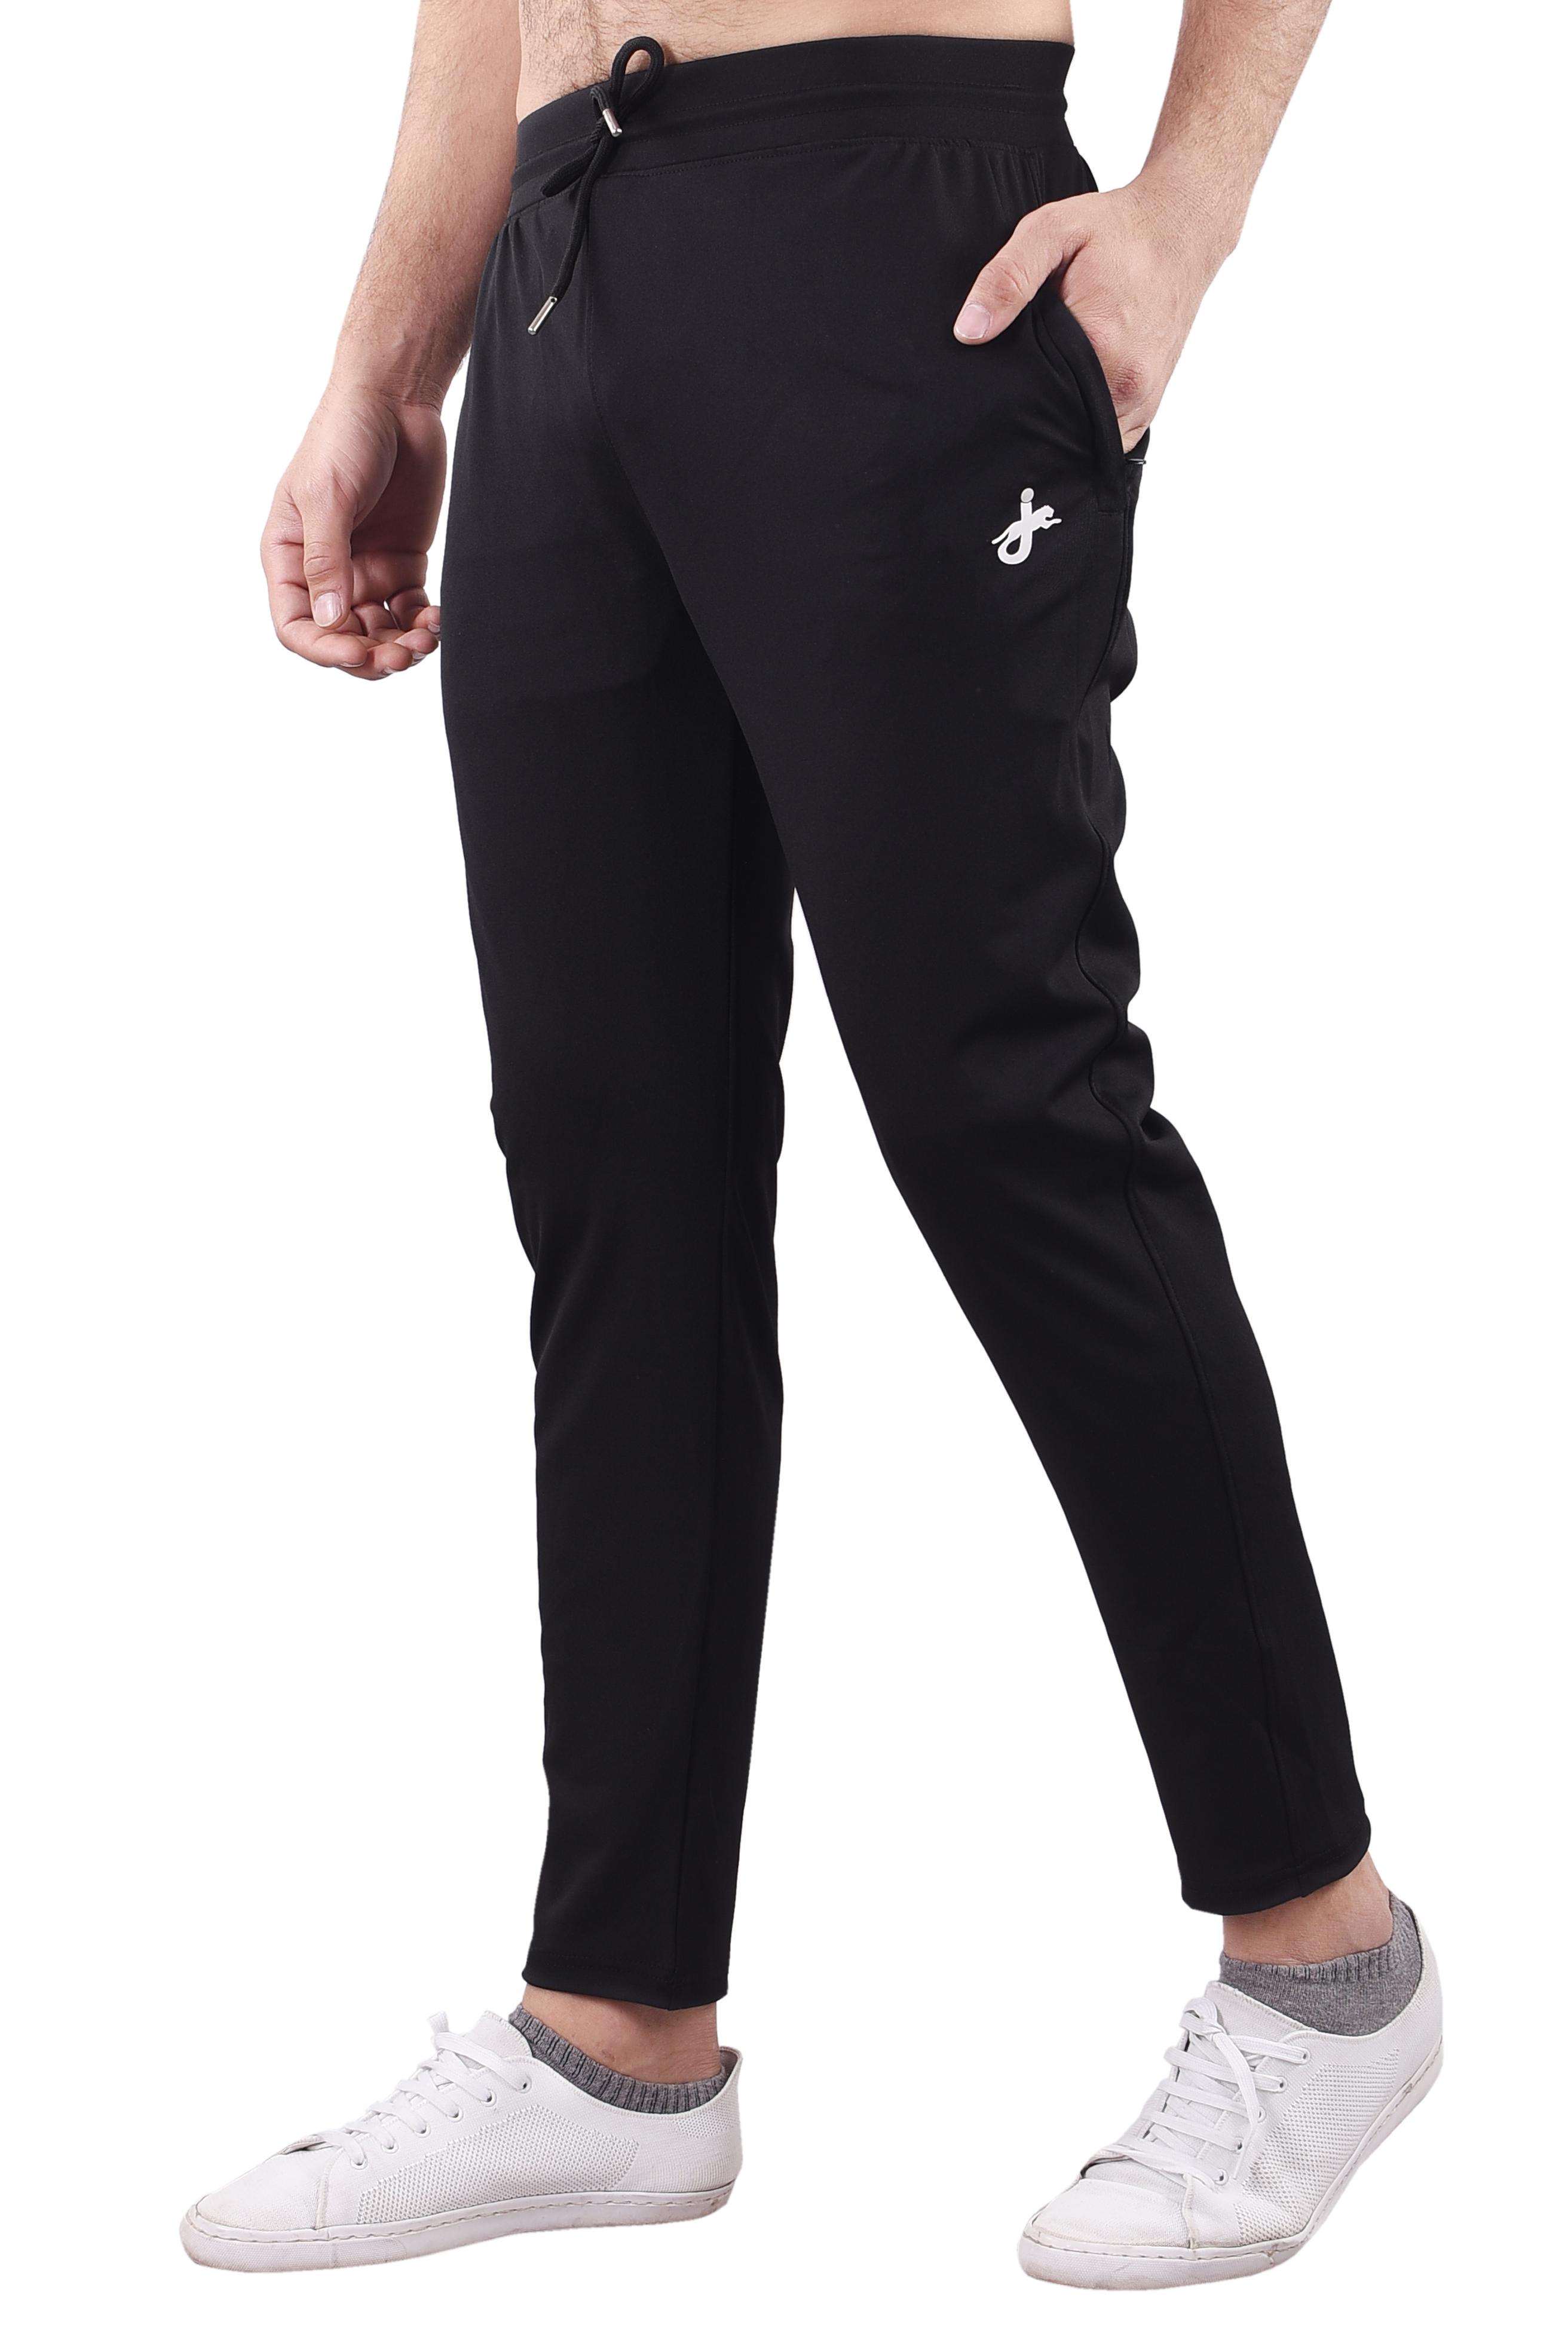 JAGURO | JAGURO Men's Polyester Solid Black Casual Track-Pant.